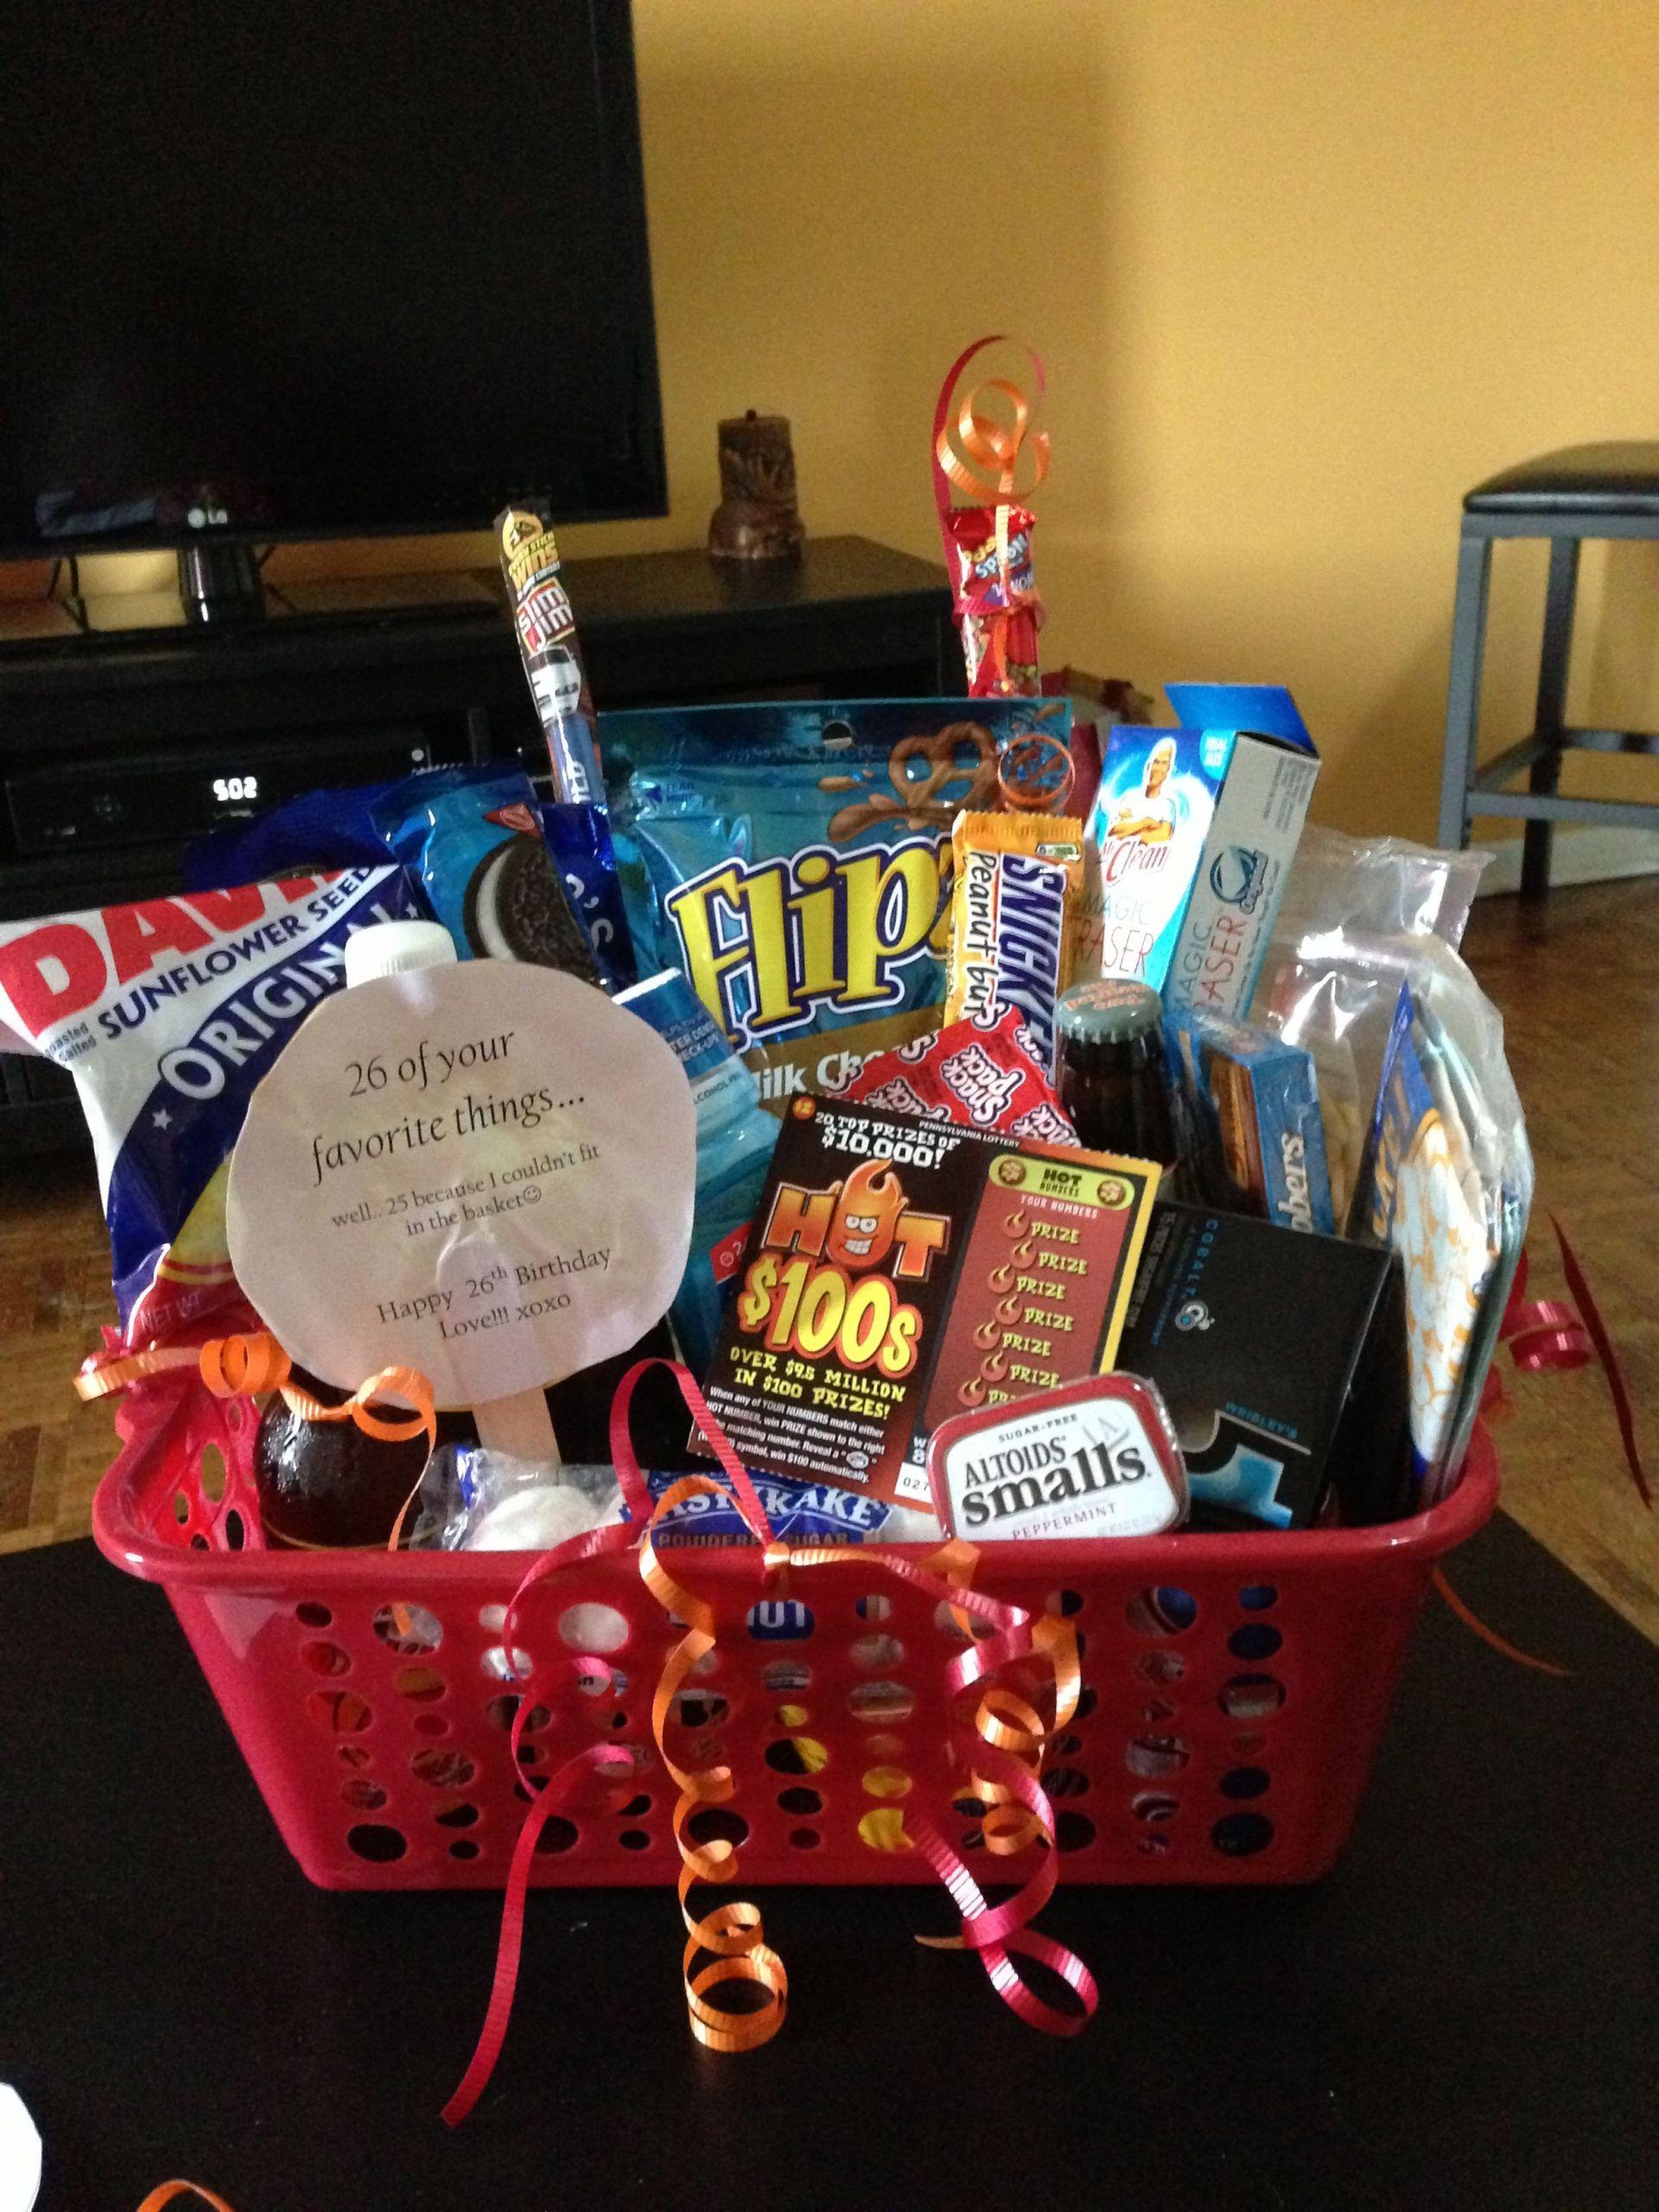 Free Gift Ideas For Boyfriend  Boyfriend birthday basket 26 of his favorite things for